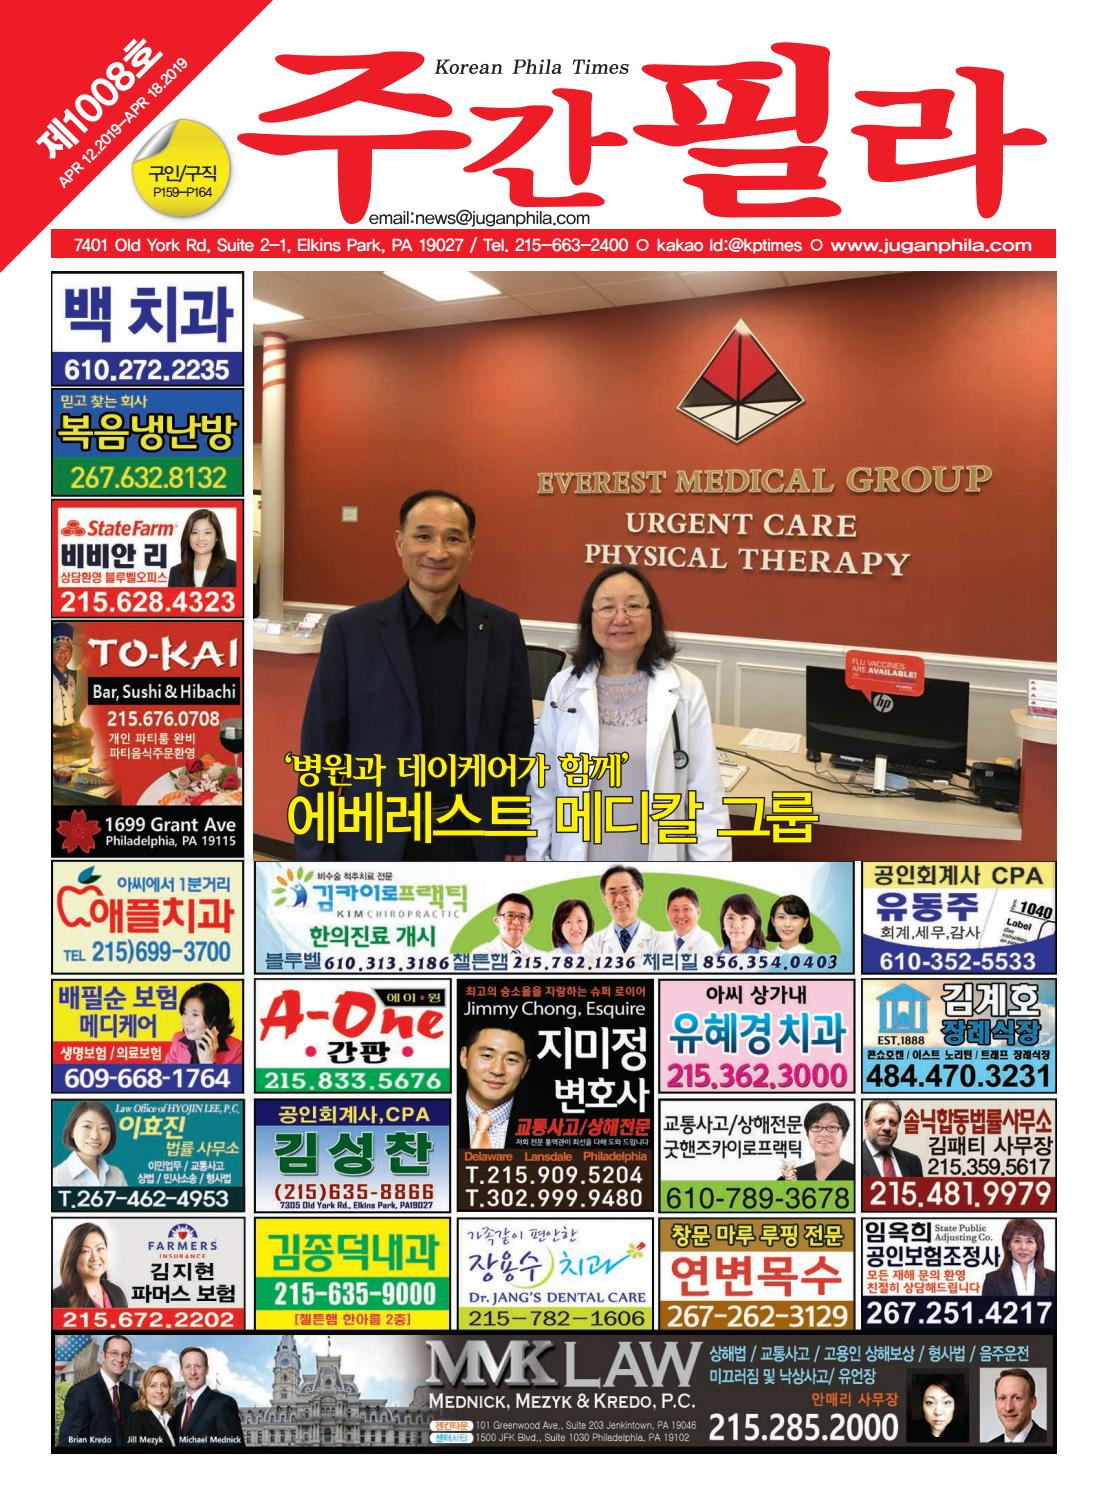 022a1b96773 Korean Phila Times Vol 1008 April 12th 2019 by Korean Phila Times - issuu